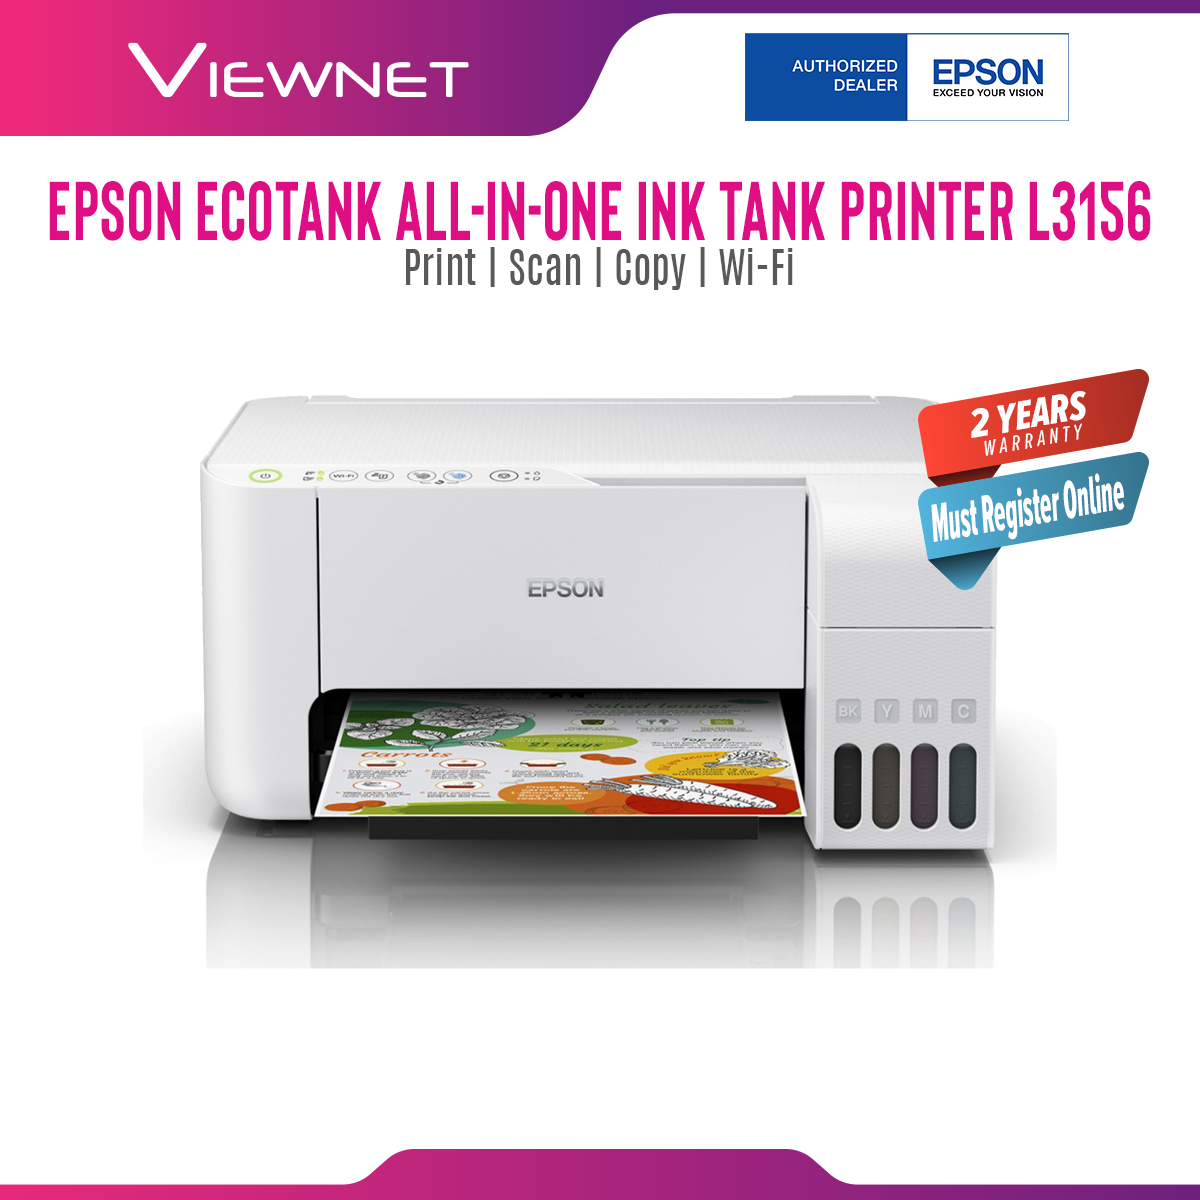 Epson EcoTank L3156 All-In-One Ink Tank Colour (Print/Scan/Copy/Wi-Fi) Printer